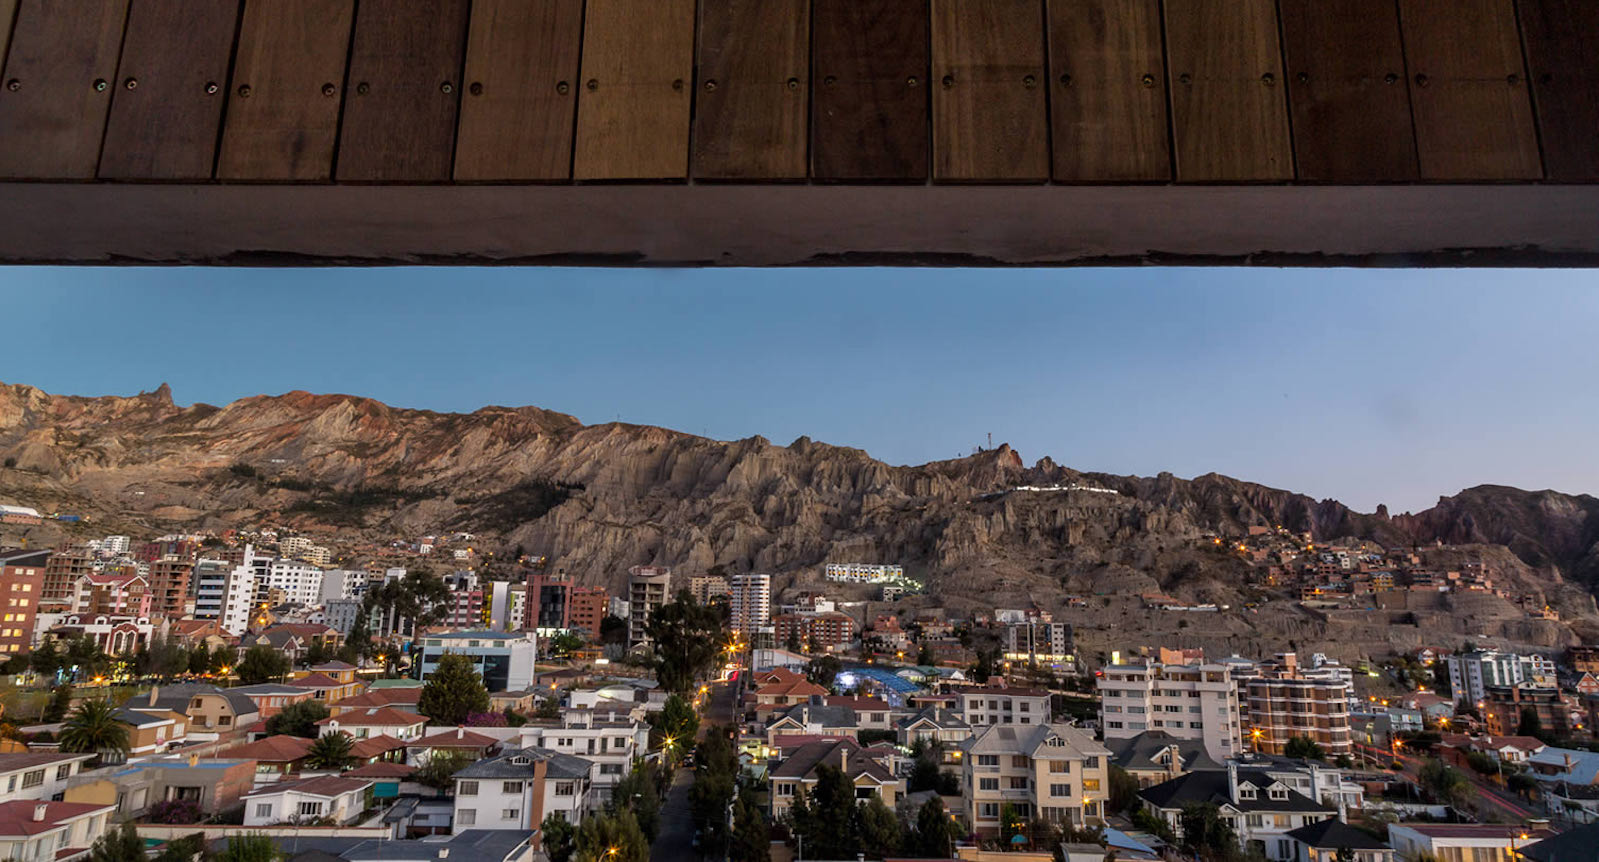 Atix Hotel La Paz Bolivia